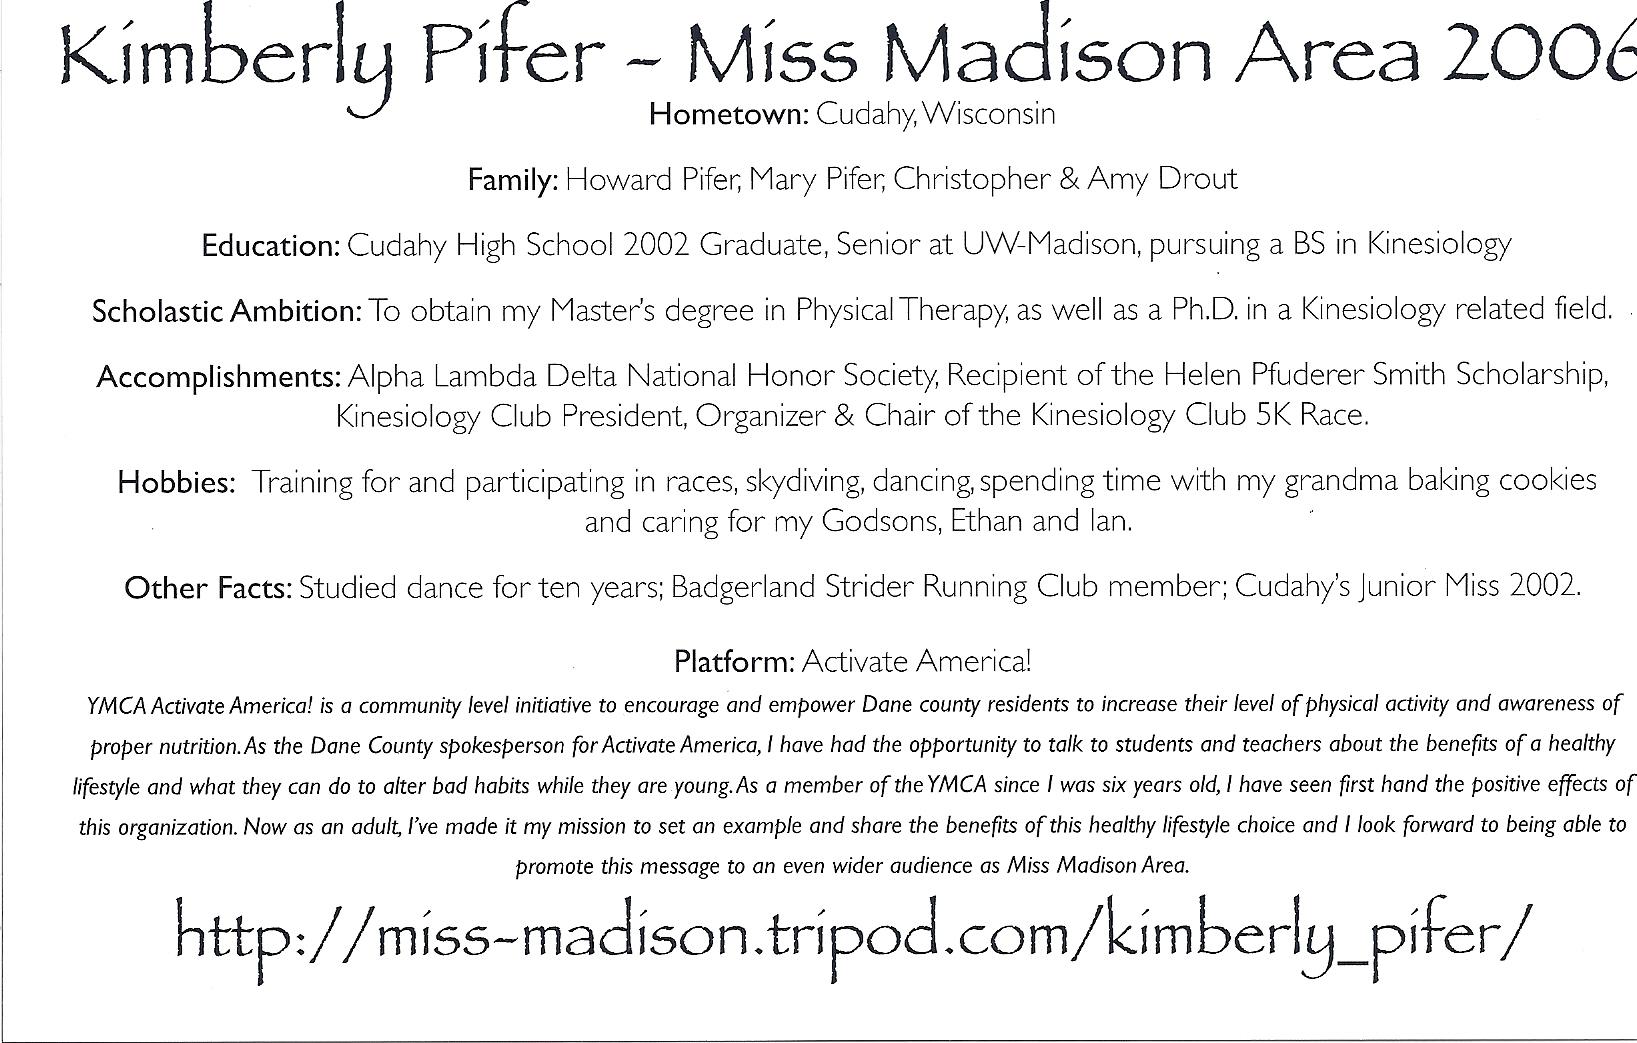 Kimberly Pifer, Miss Madison Area 2006